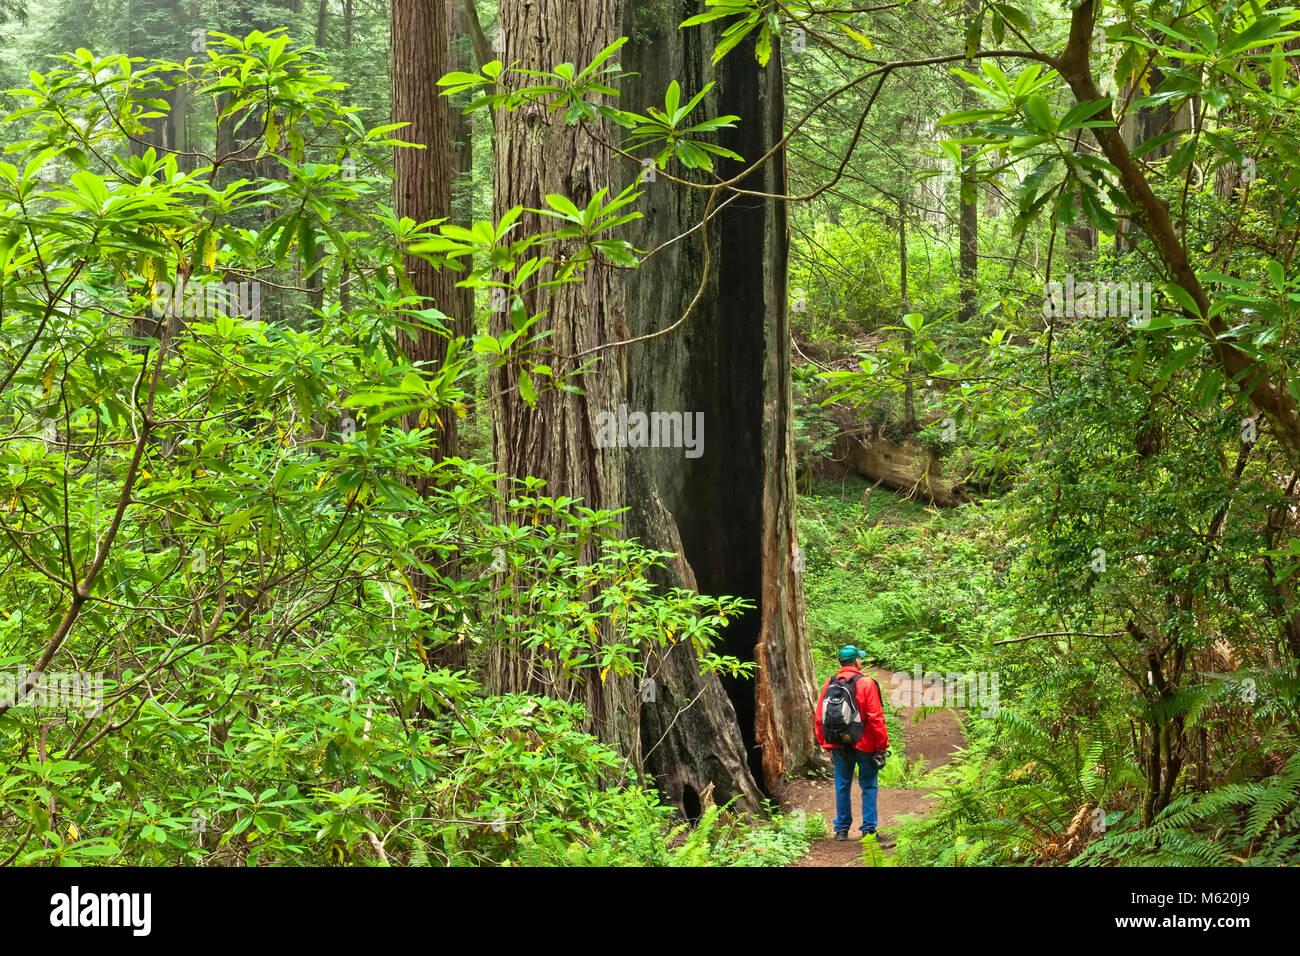 Redwood Forest 'Sequoia sempervirens',  Rhodondrons, Sword ferns, Damnation Creek Trail. - Stock Image